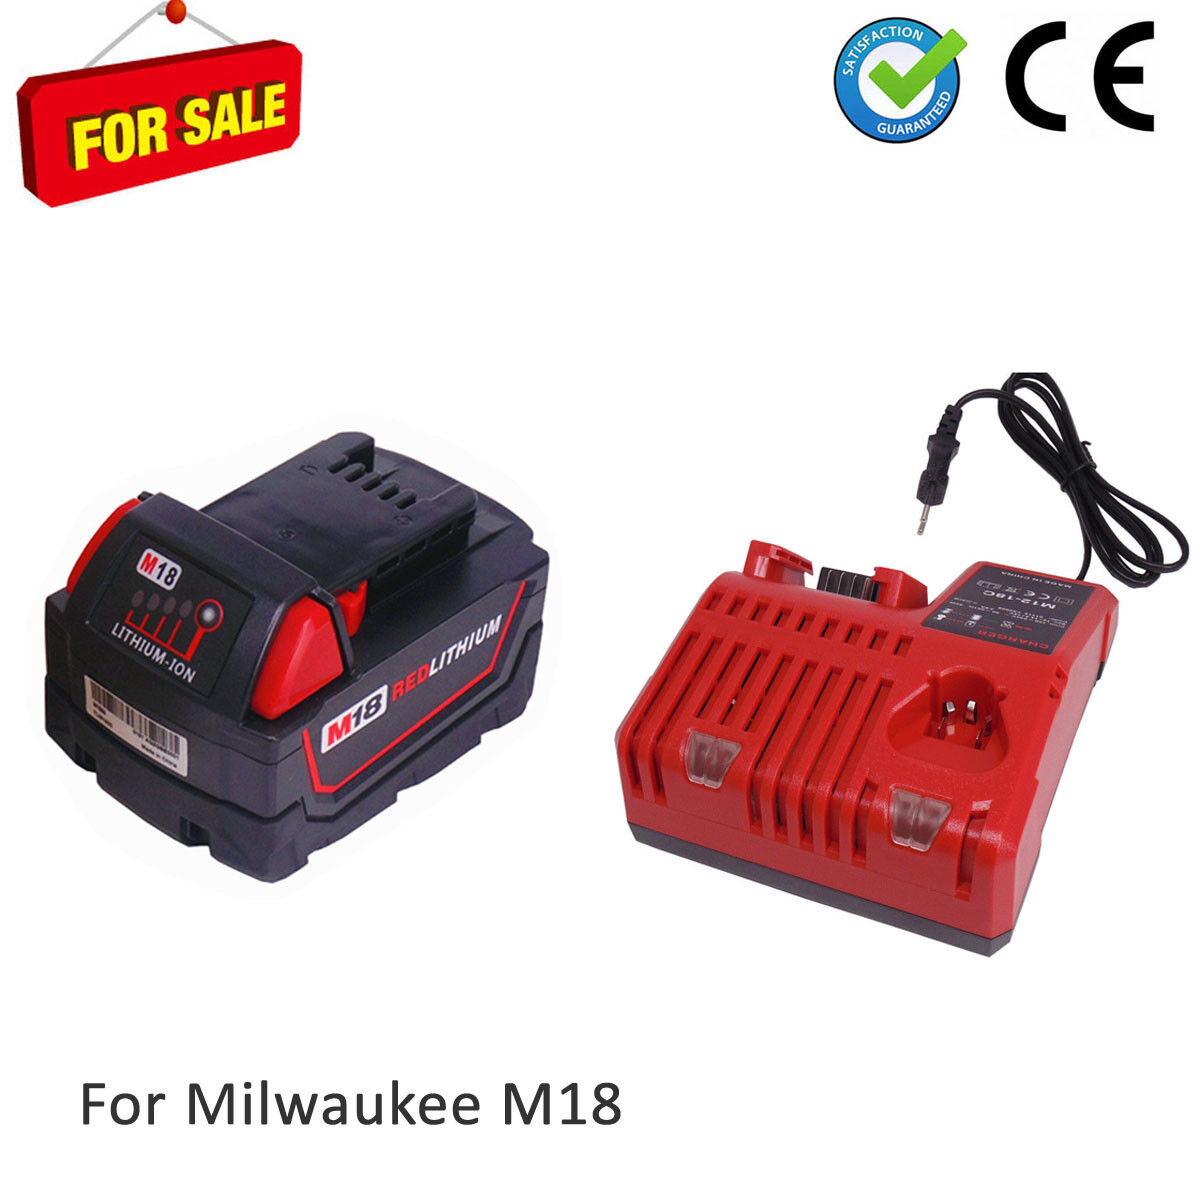 Milwaukee M18B5 18V 5,0Ah Lithiumion Akku M18B4 and Ladegerät M18 M12-18C DE